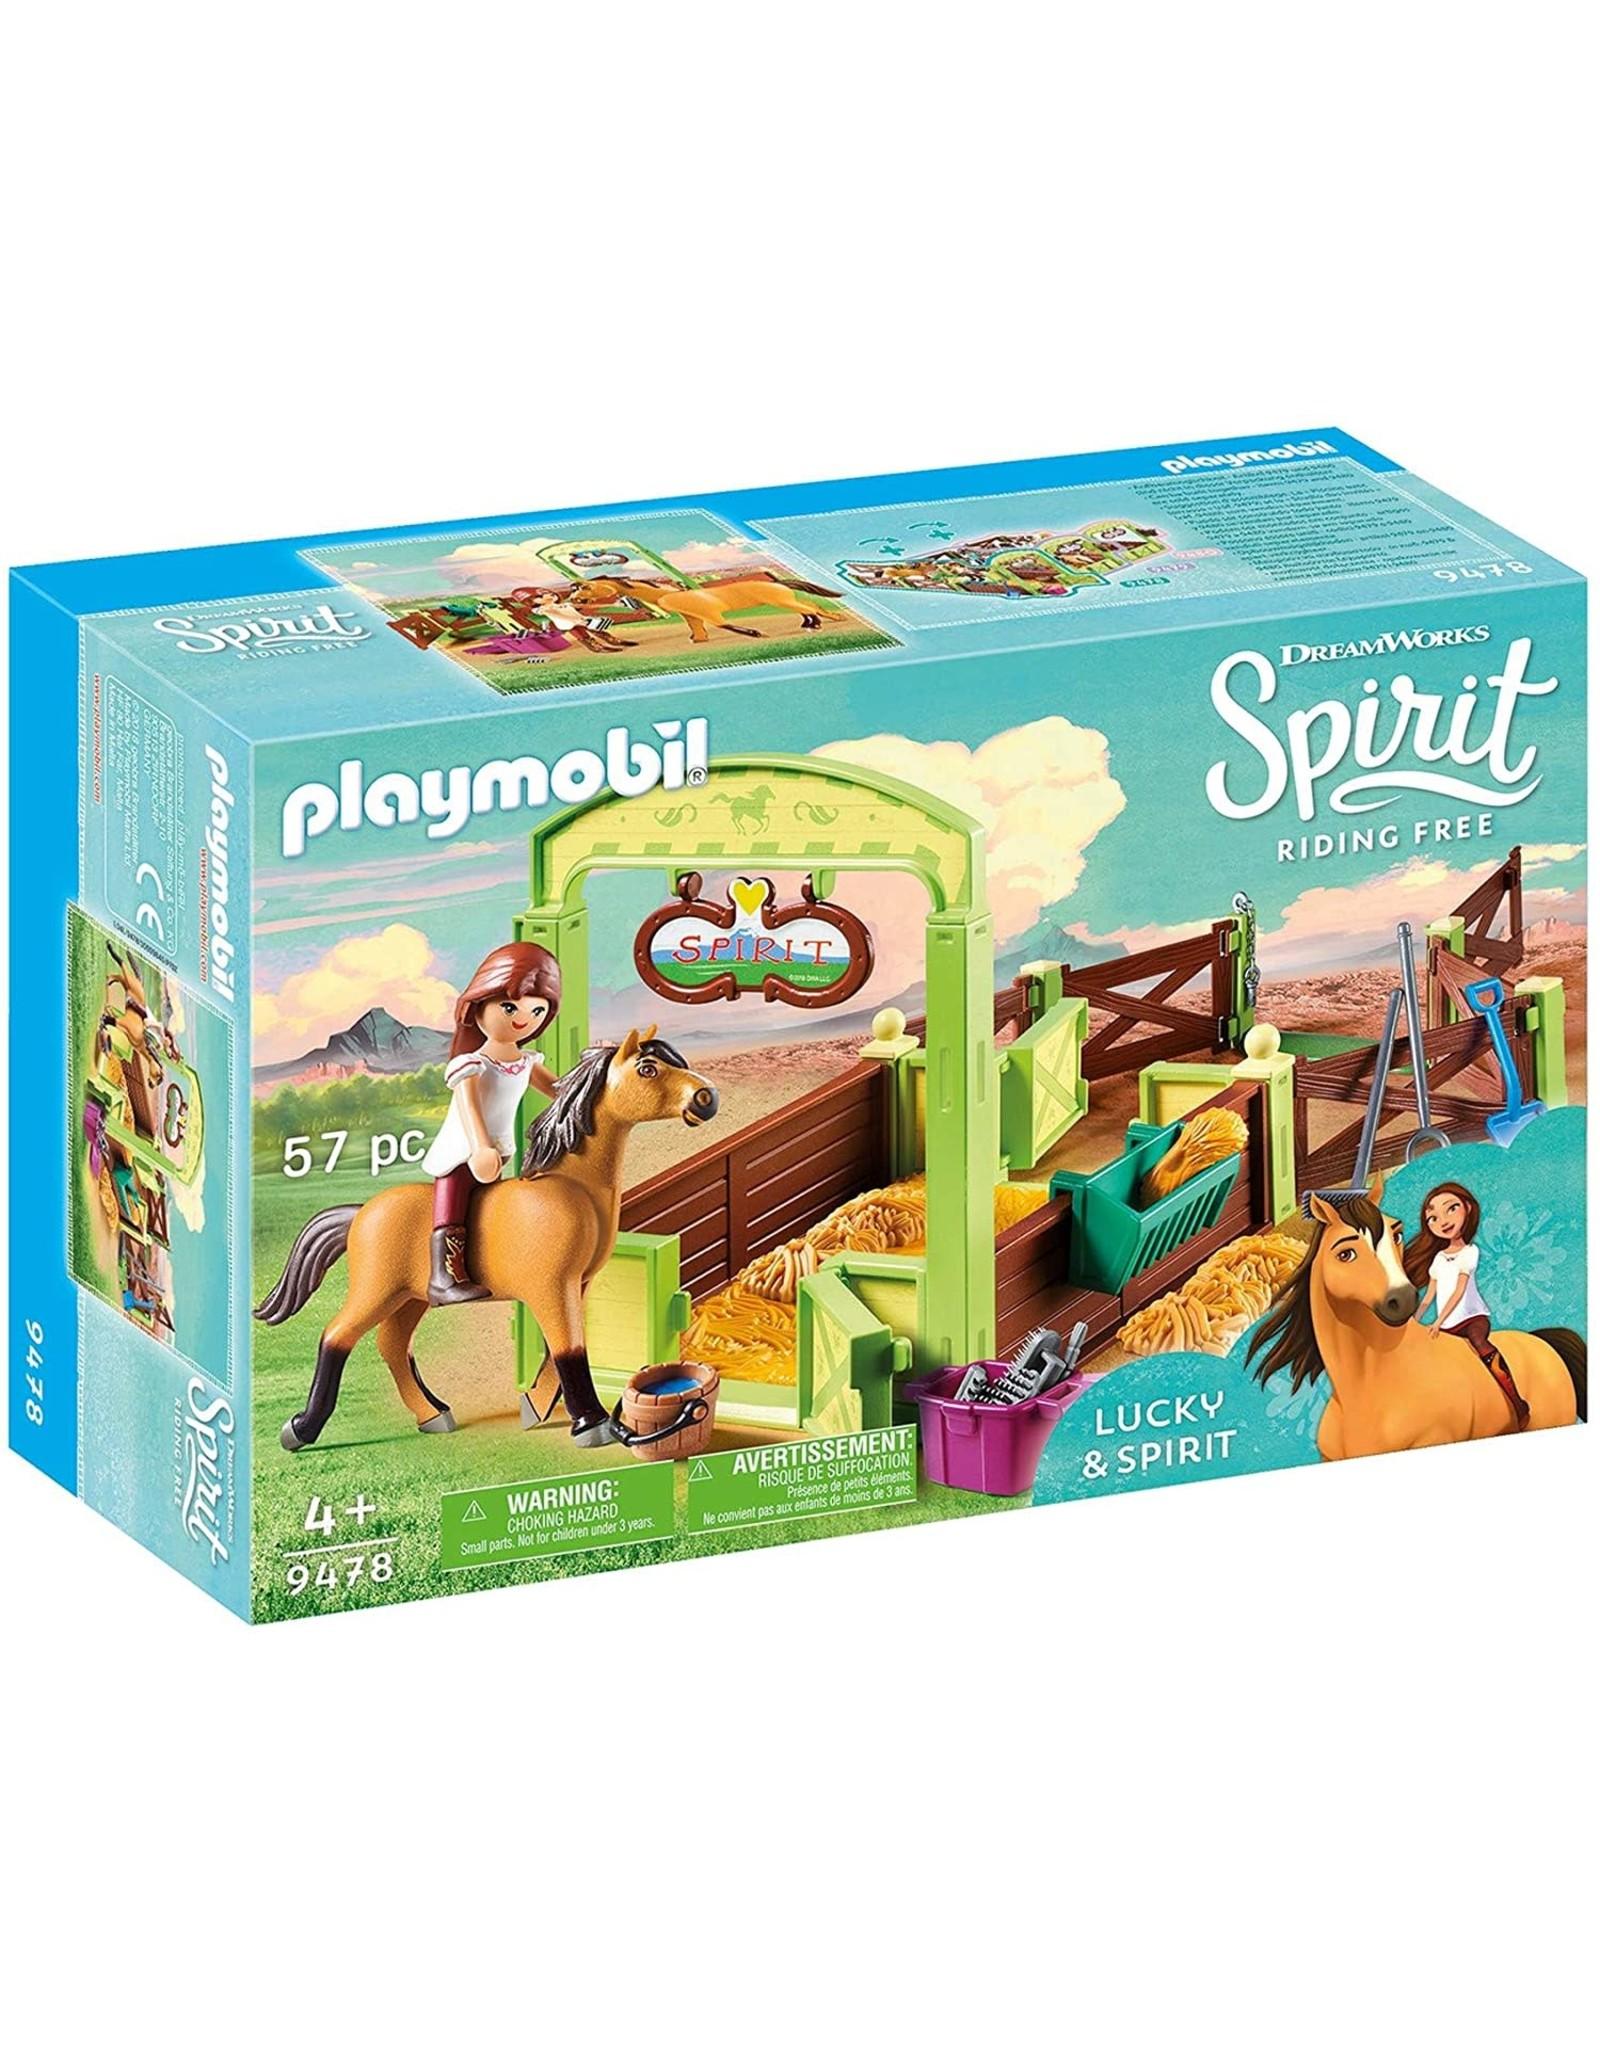 Playmobil Lucky & Spirit